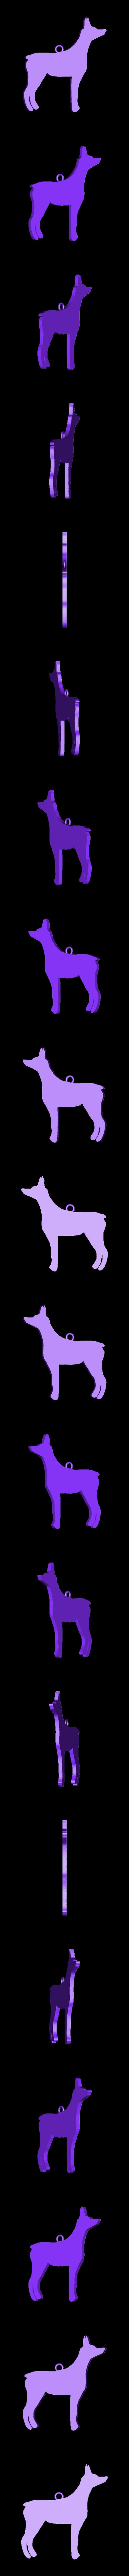 24.stl Download STL file Dogs • 3D printing object, GENNADI3313